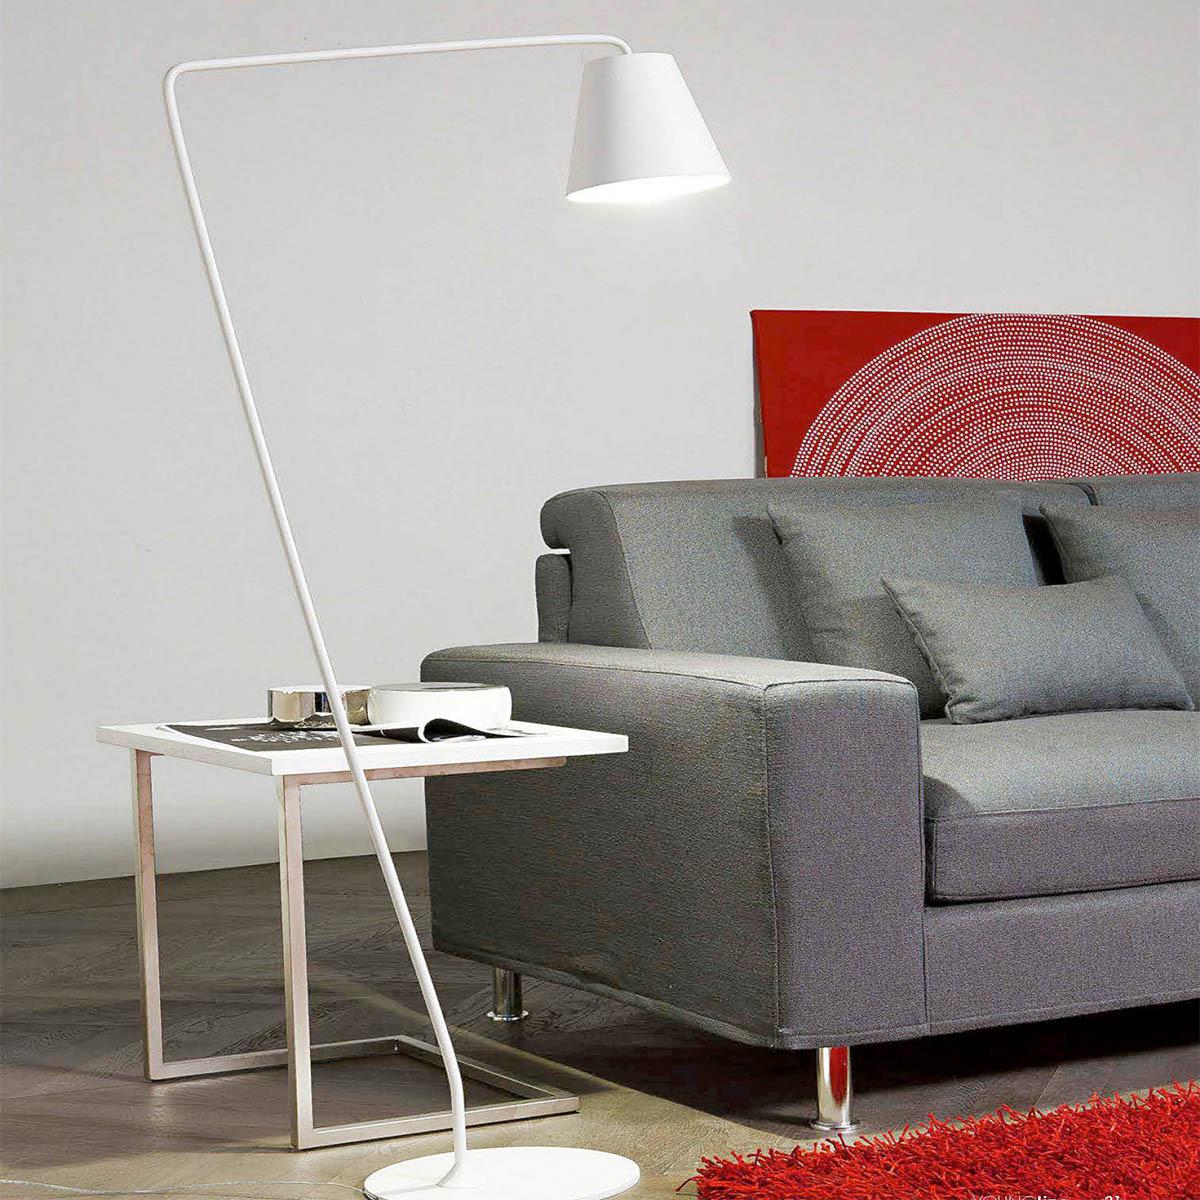 Podna lampa CONUS 7284 bela